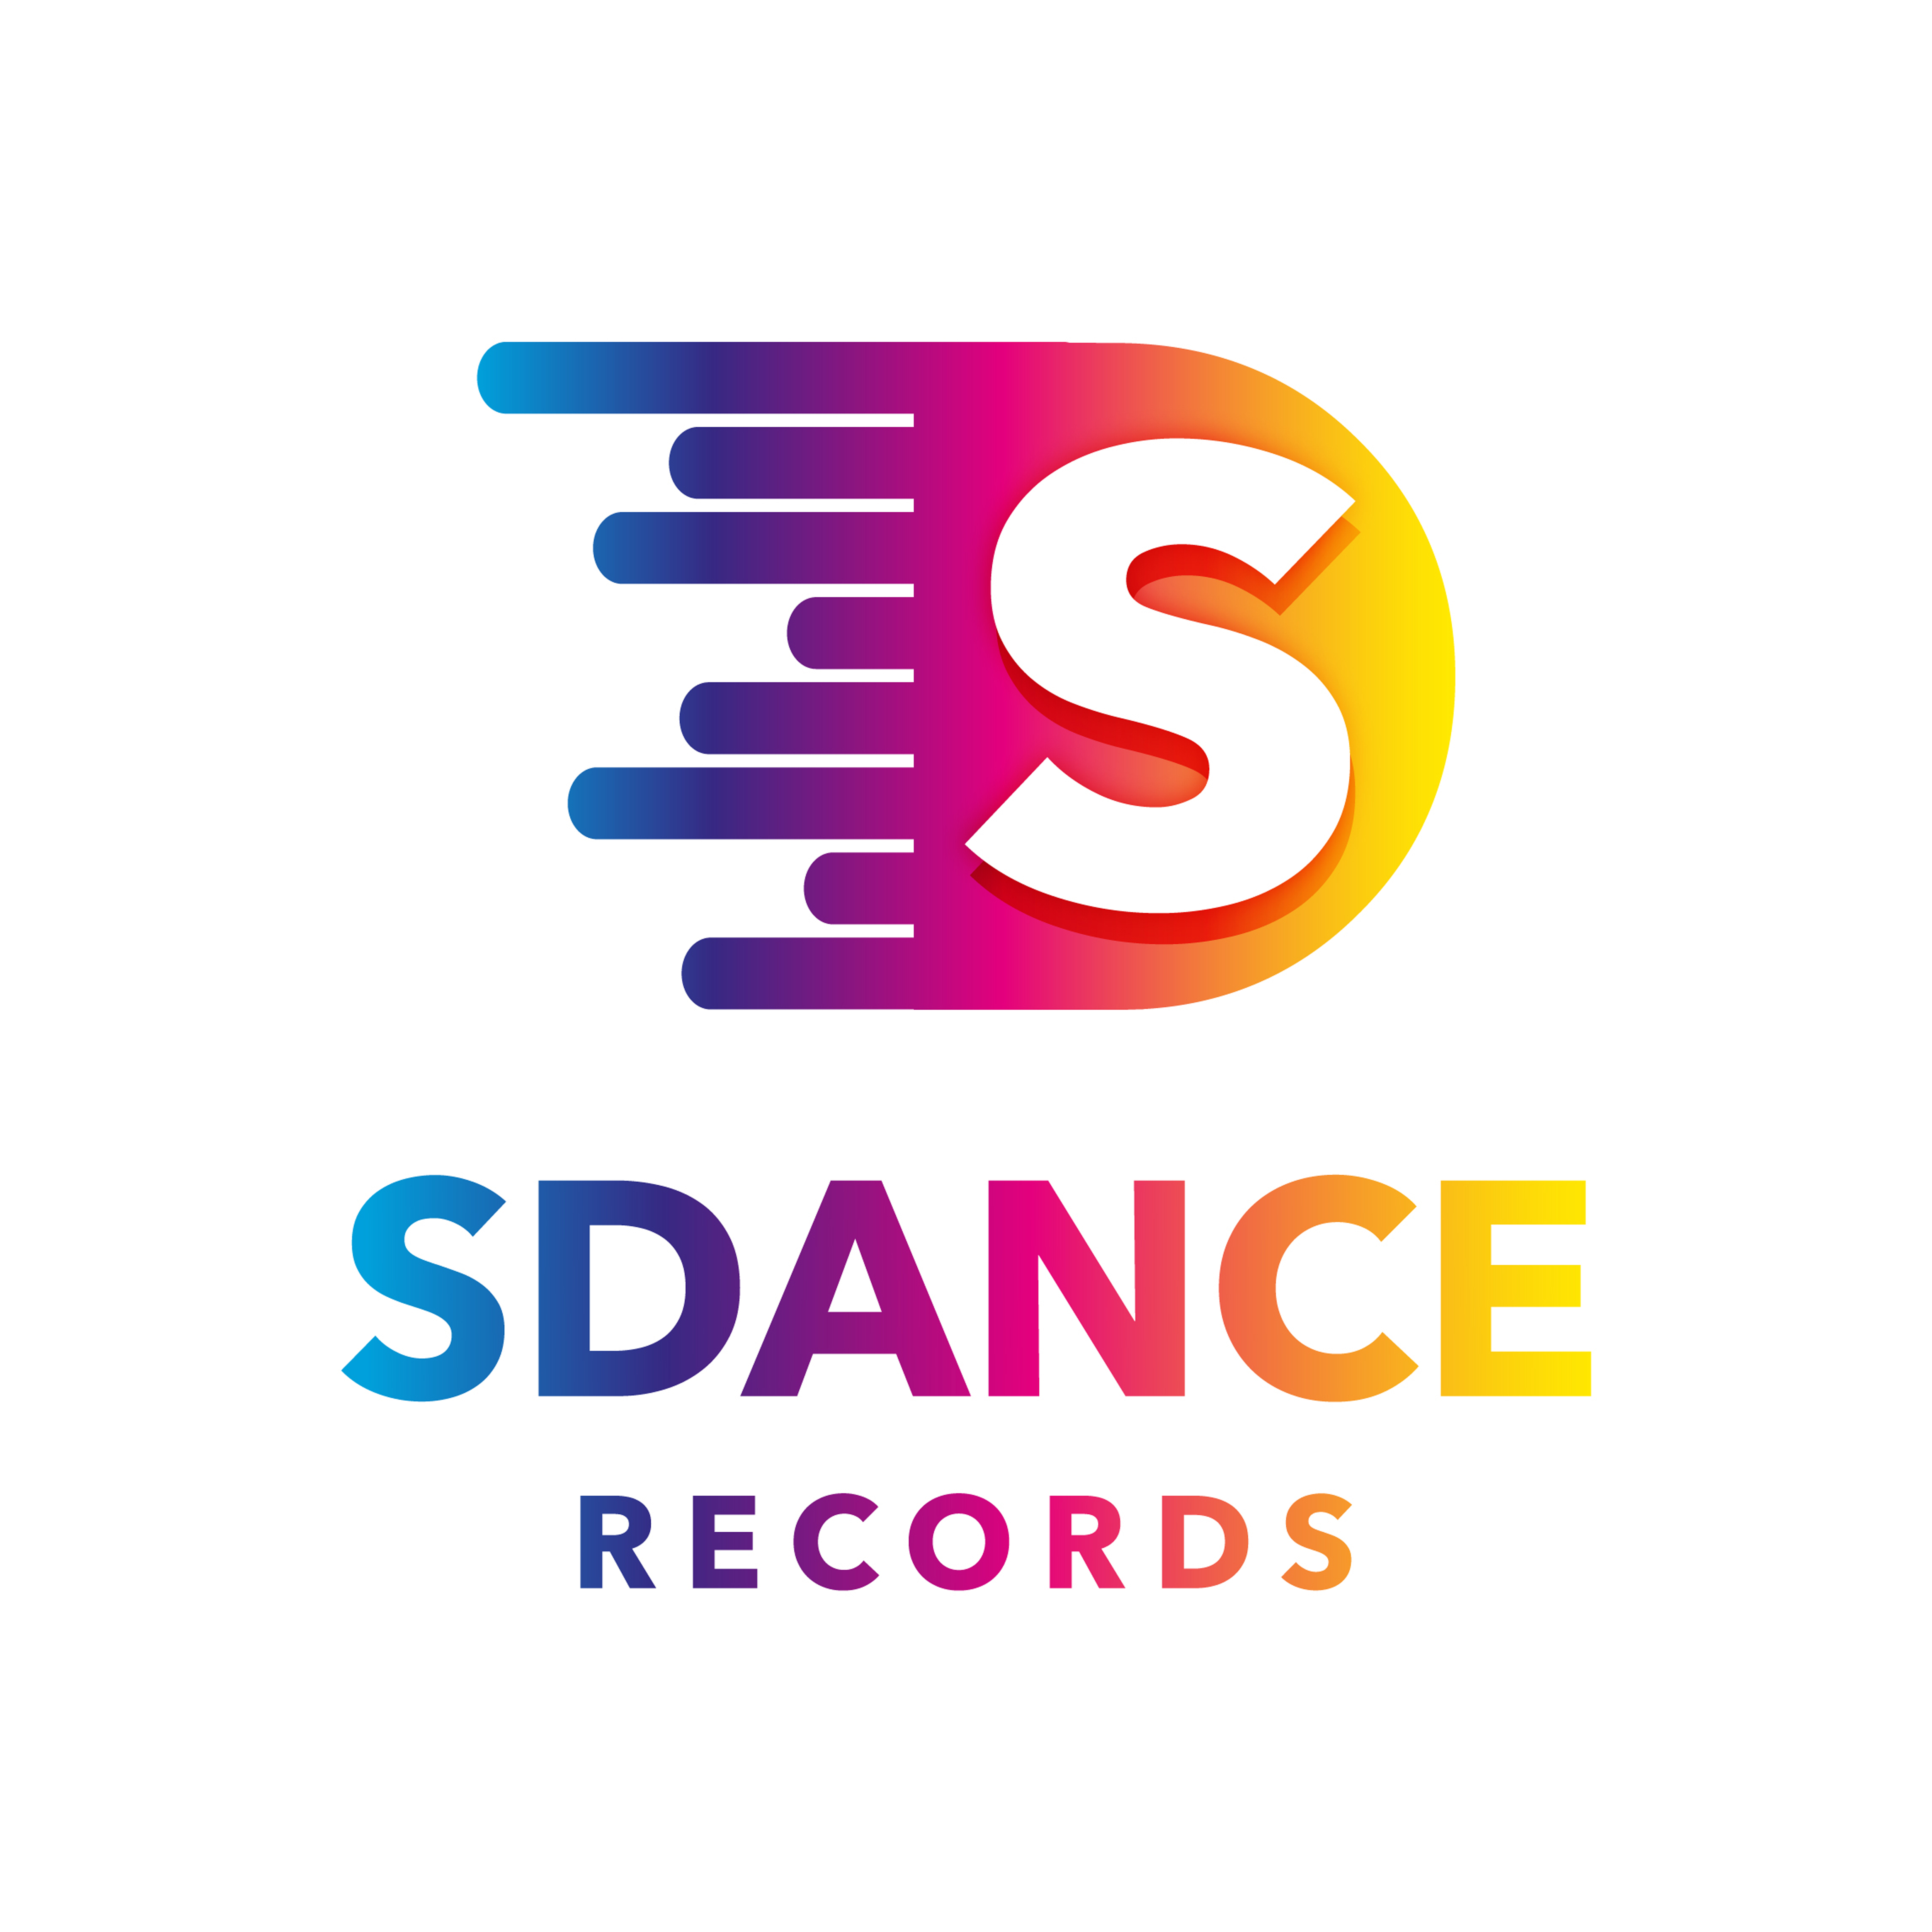 Sdance Records